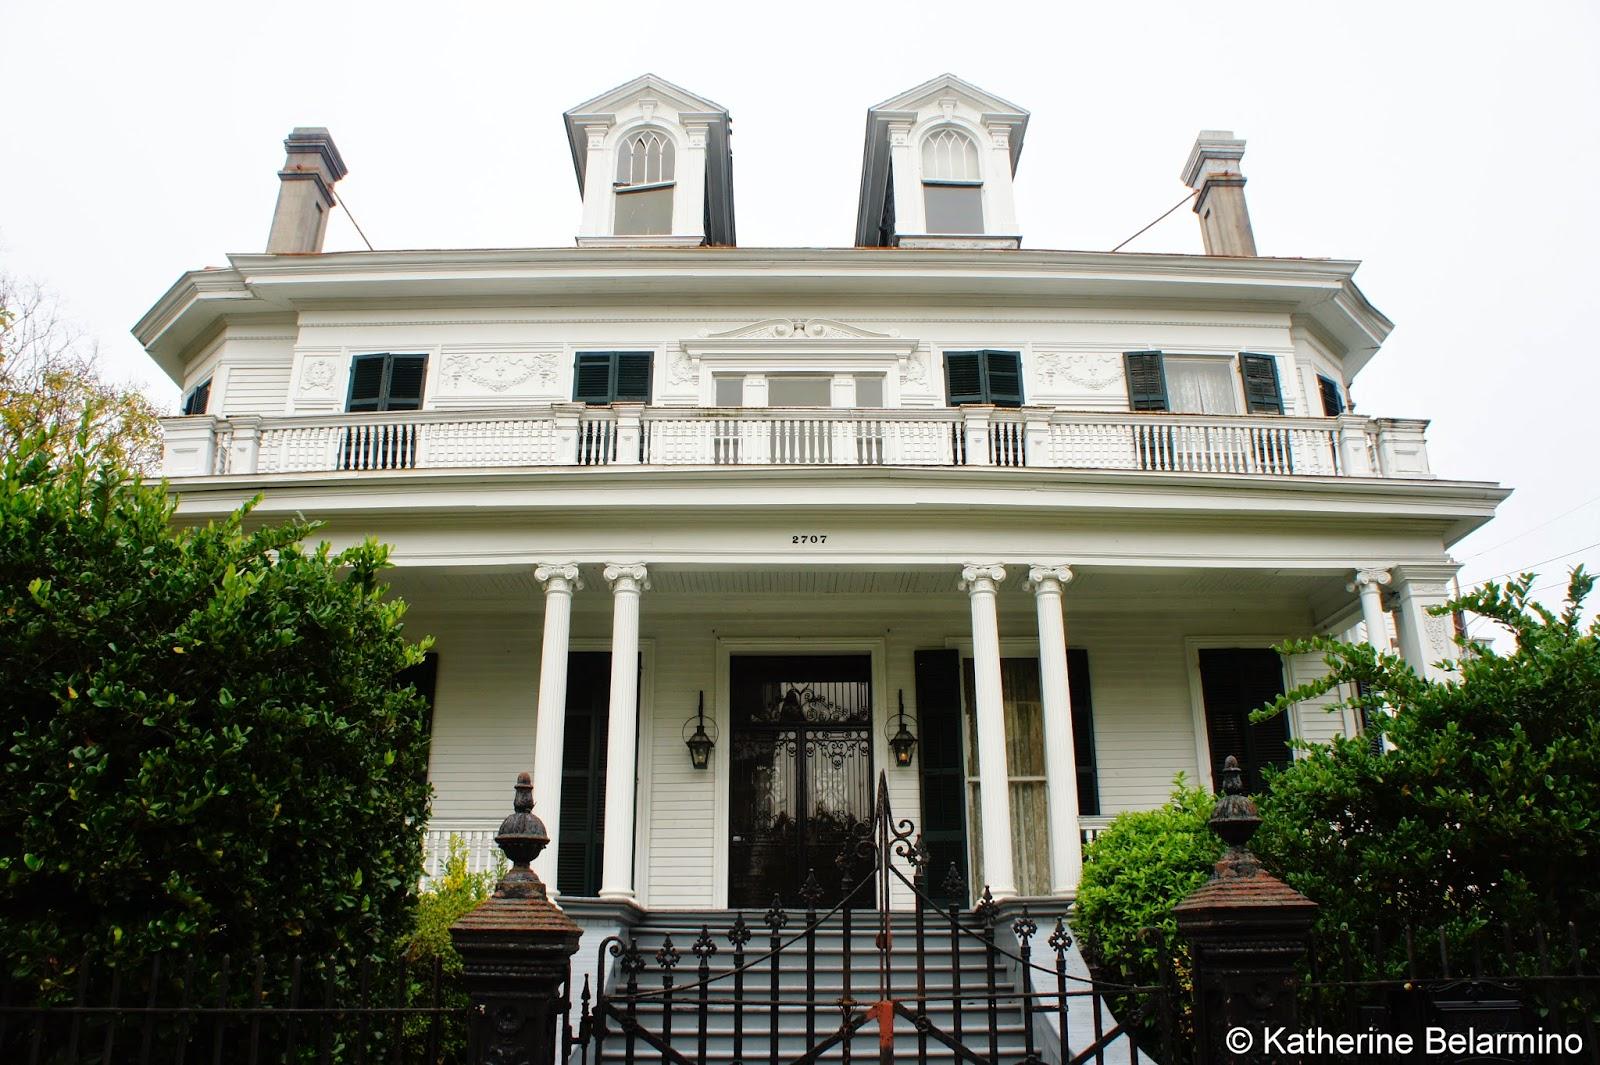 Benjamin Button House Garden District Walking Tour New Orleans & The Walking Tours of New Orleans | Travel the World pezcame.com